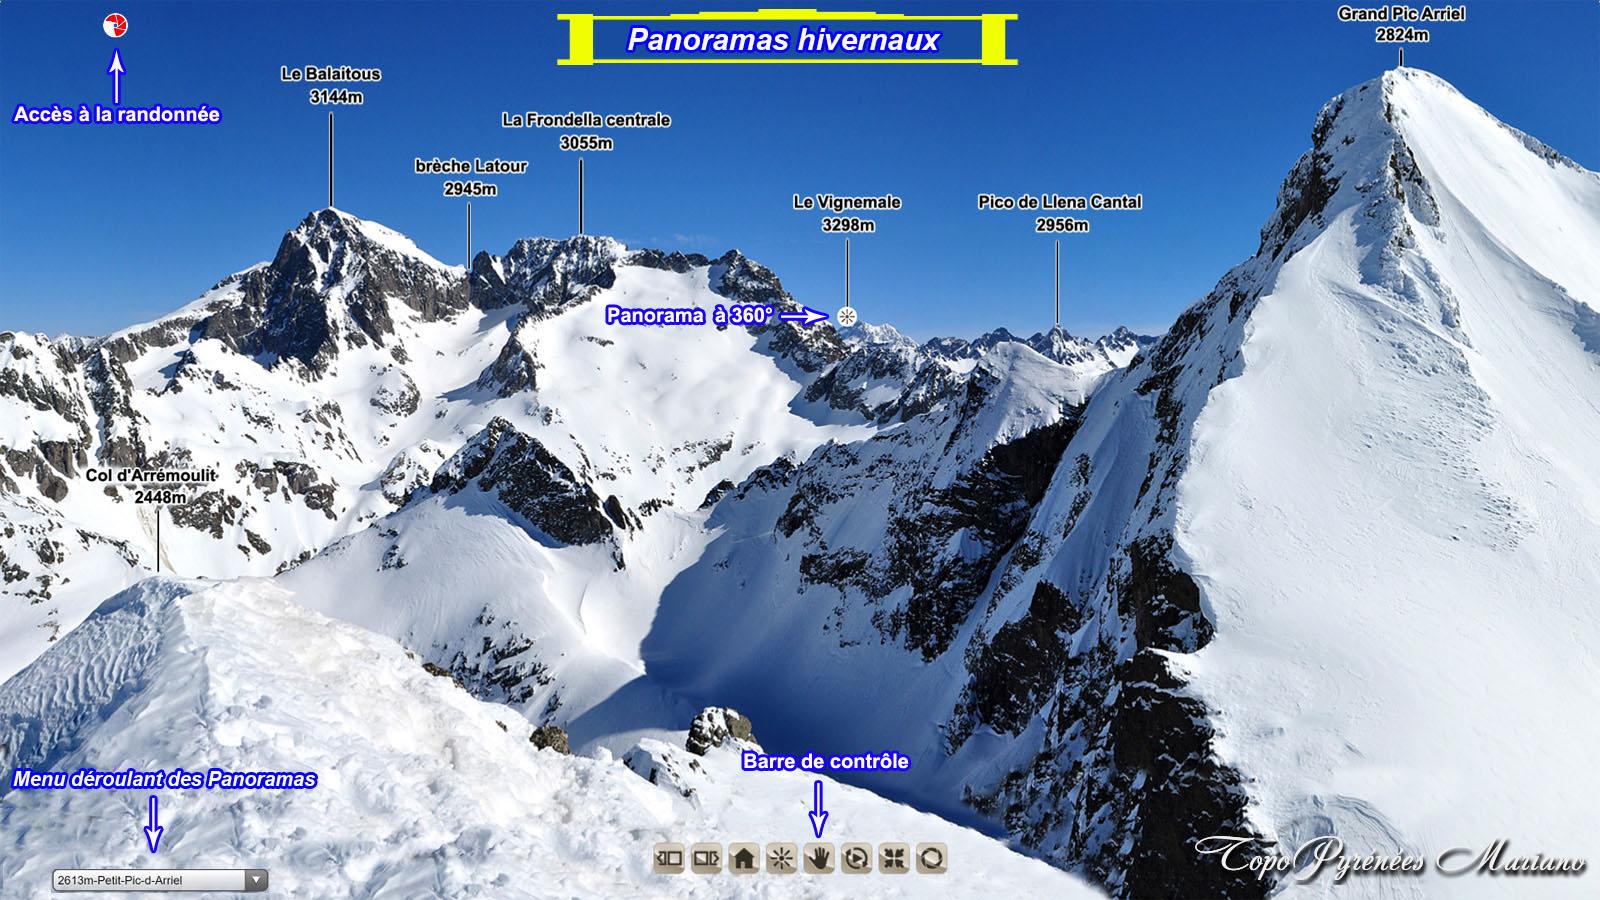 Panoramas hivernaux des Pyrénées Occidentales